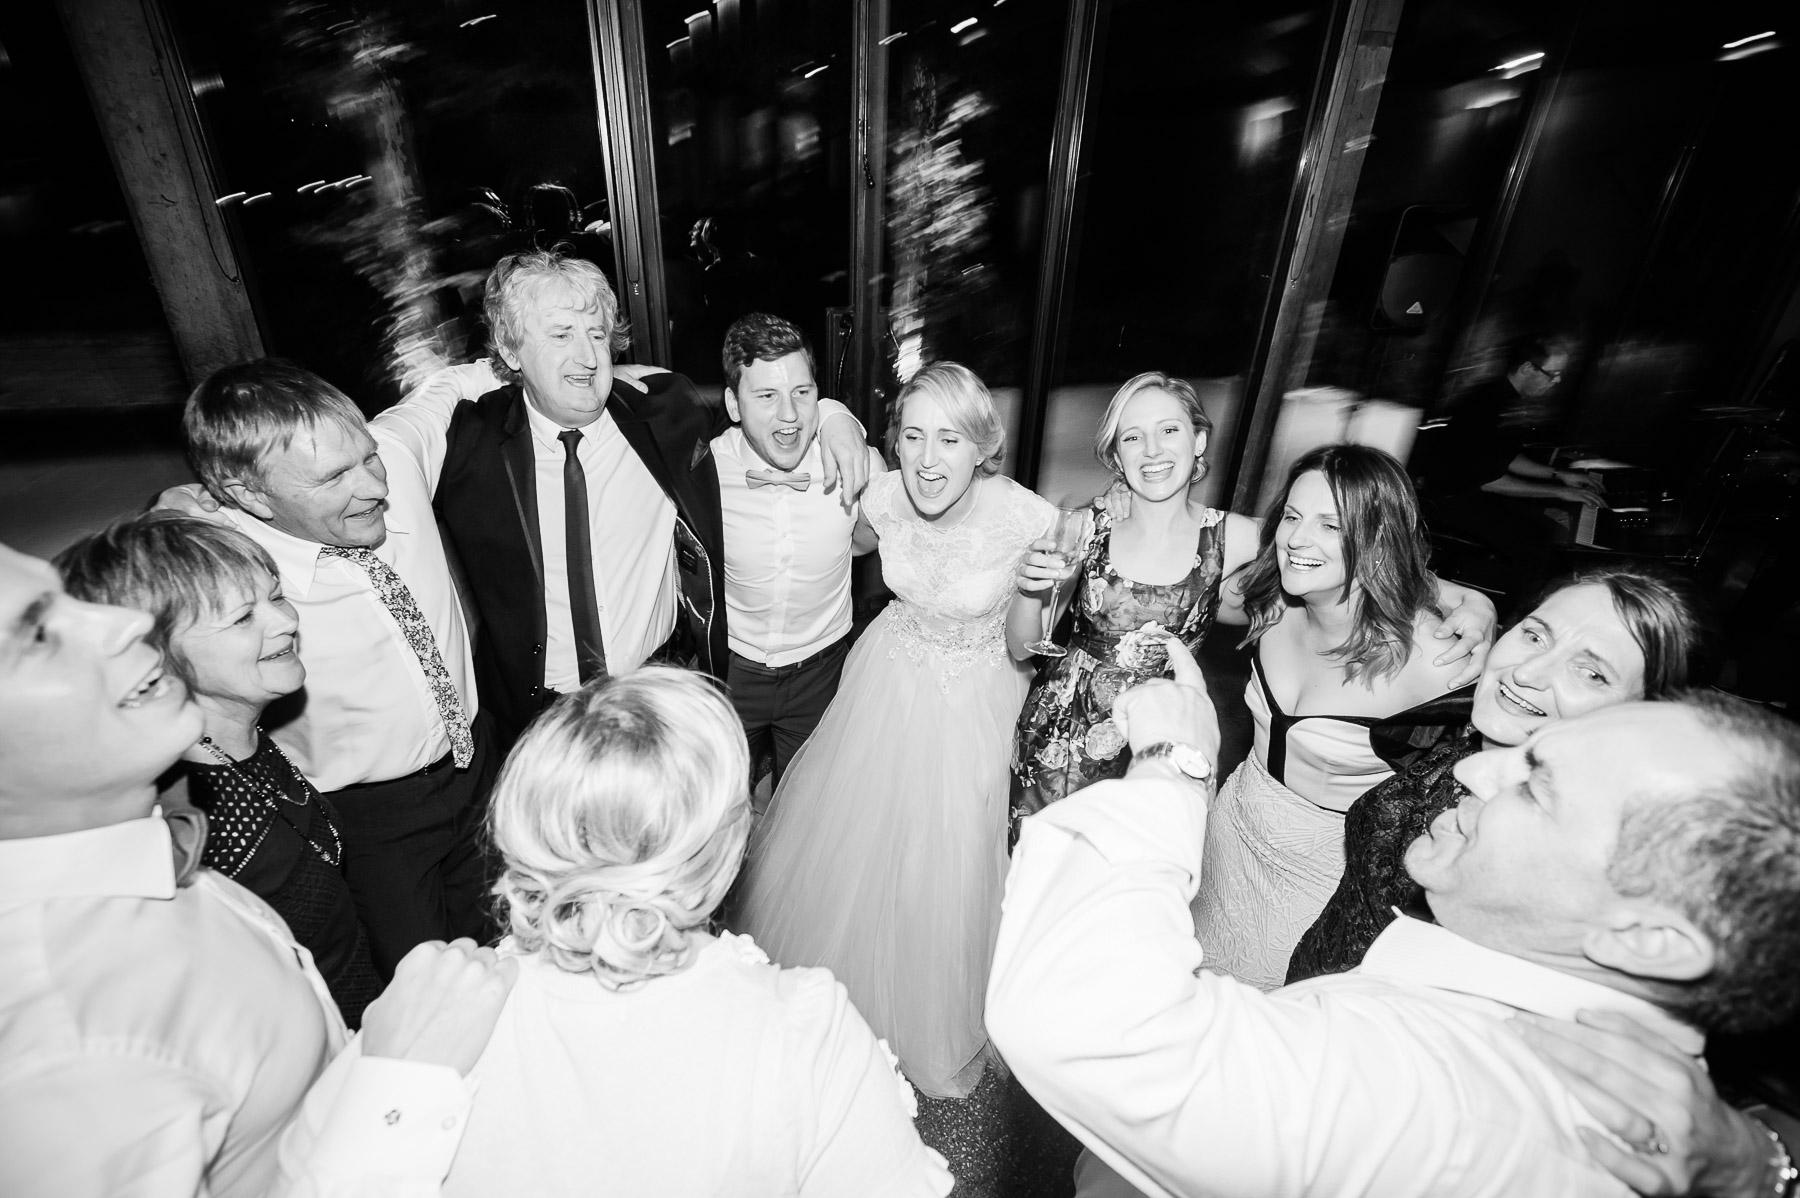 Marnie_and_Charlie_Yarra_Valley_Wedding_Blog-103.jpg